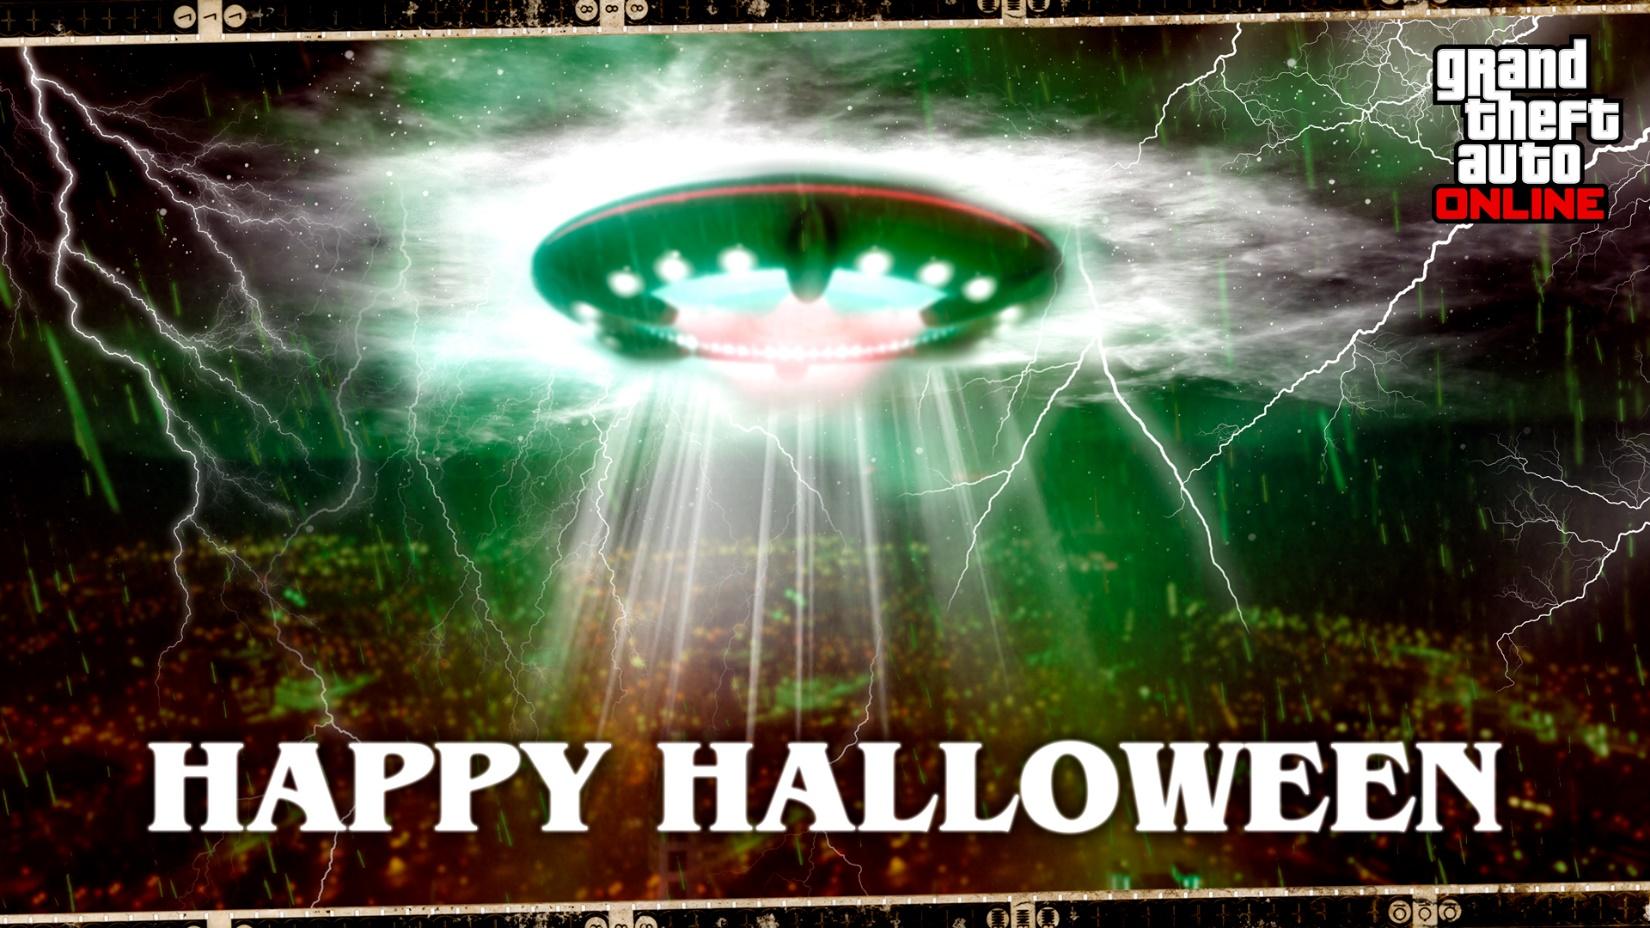 GTA Online: modalità di Halloween - veicoli fantasma e squartatori